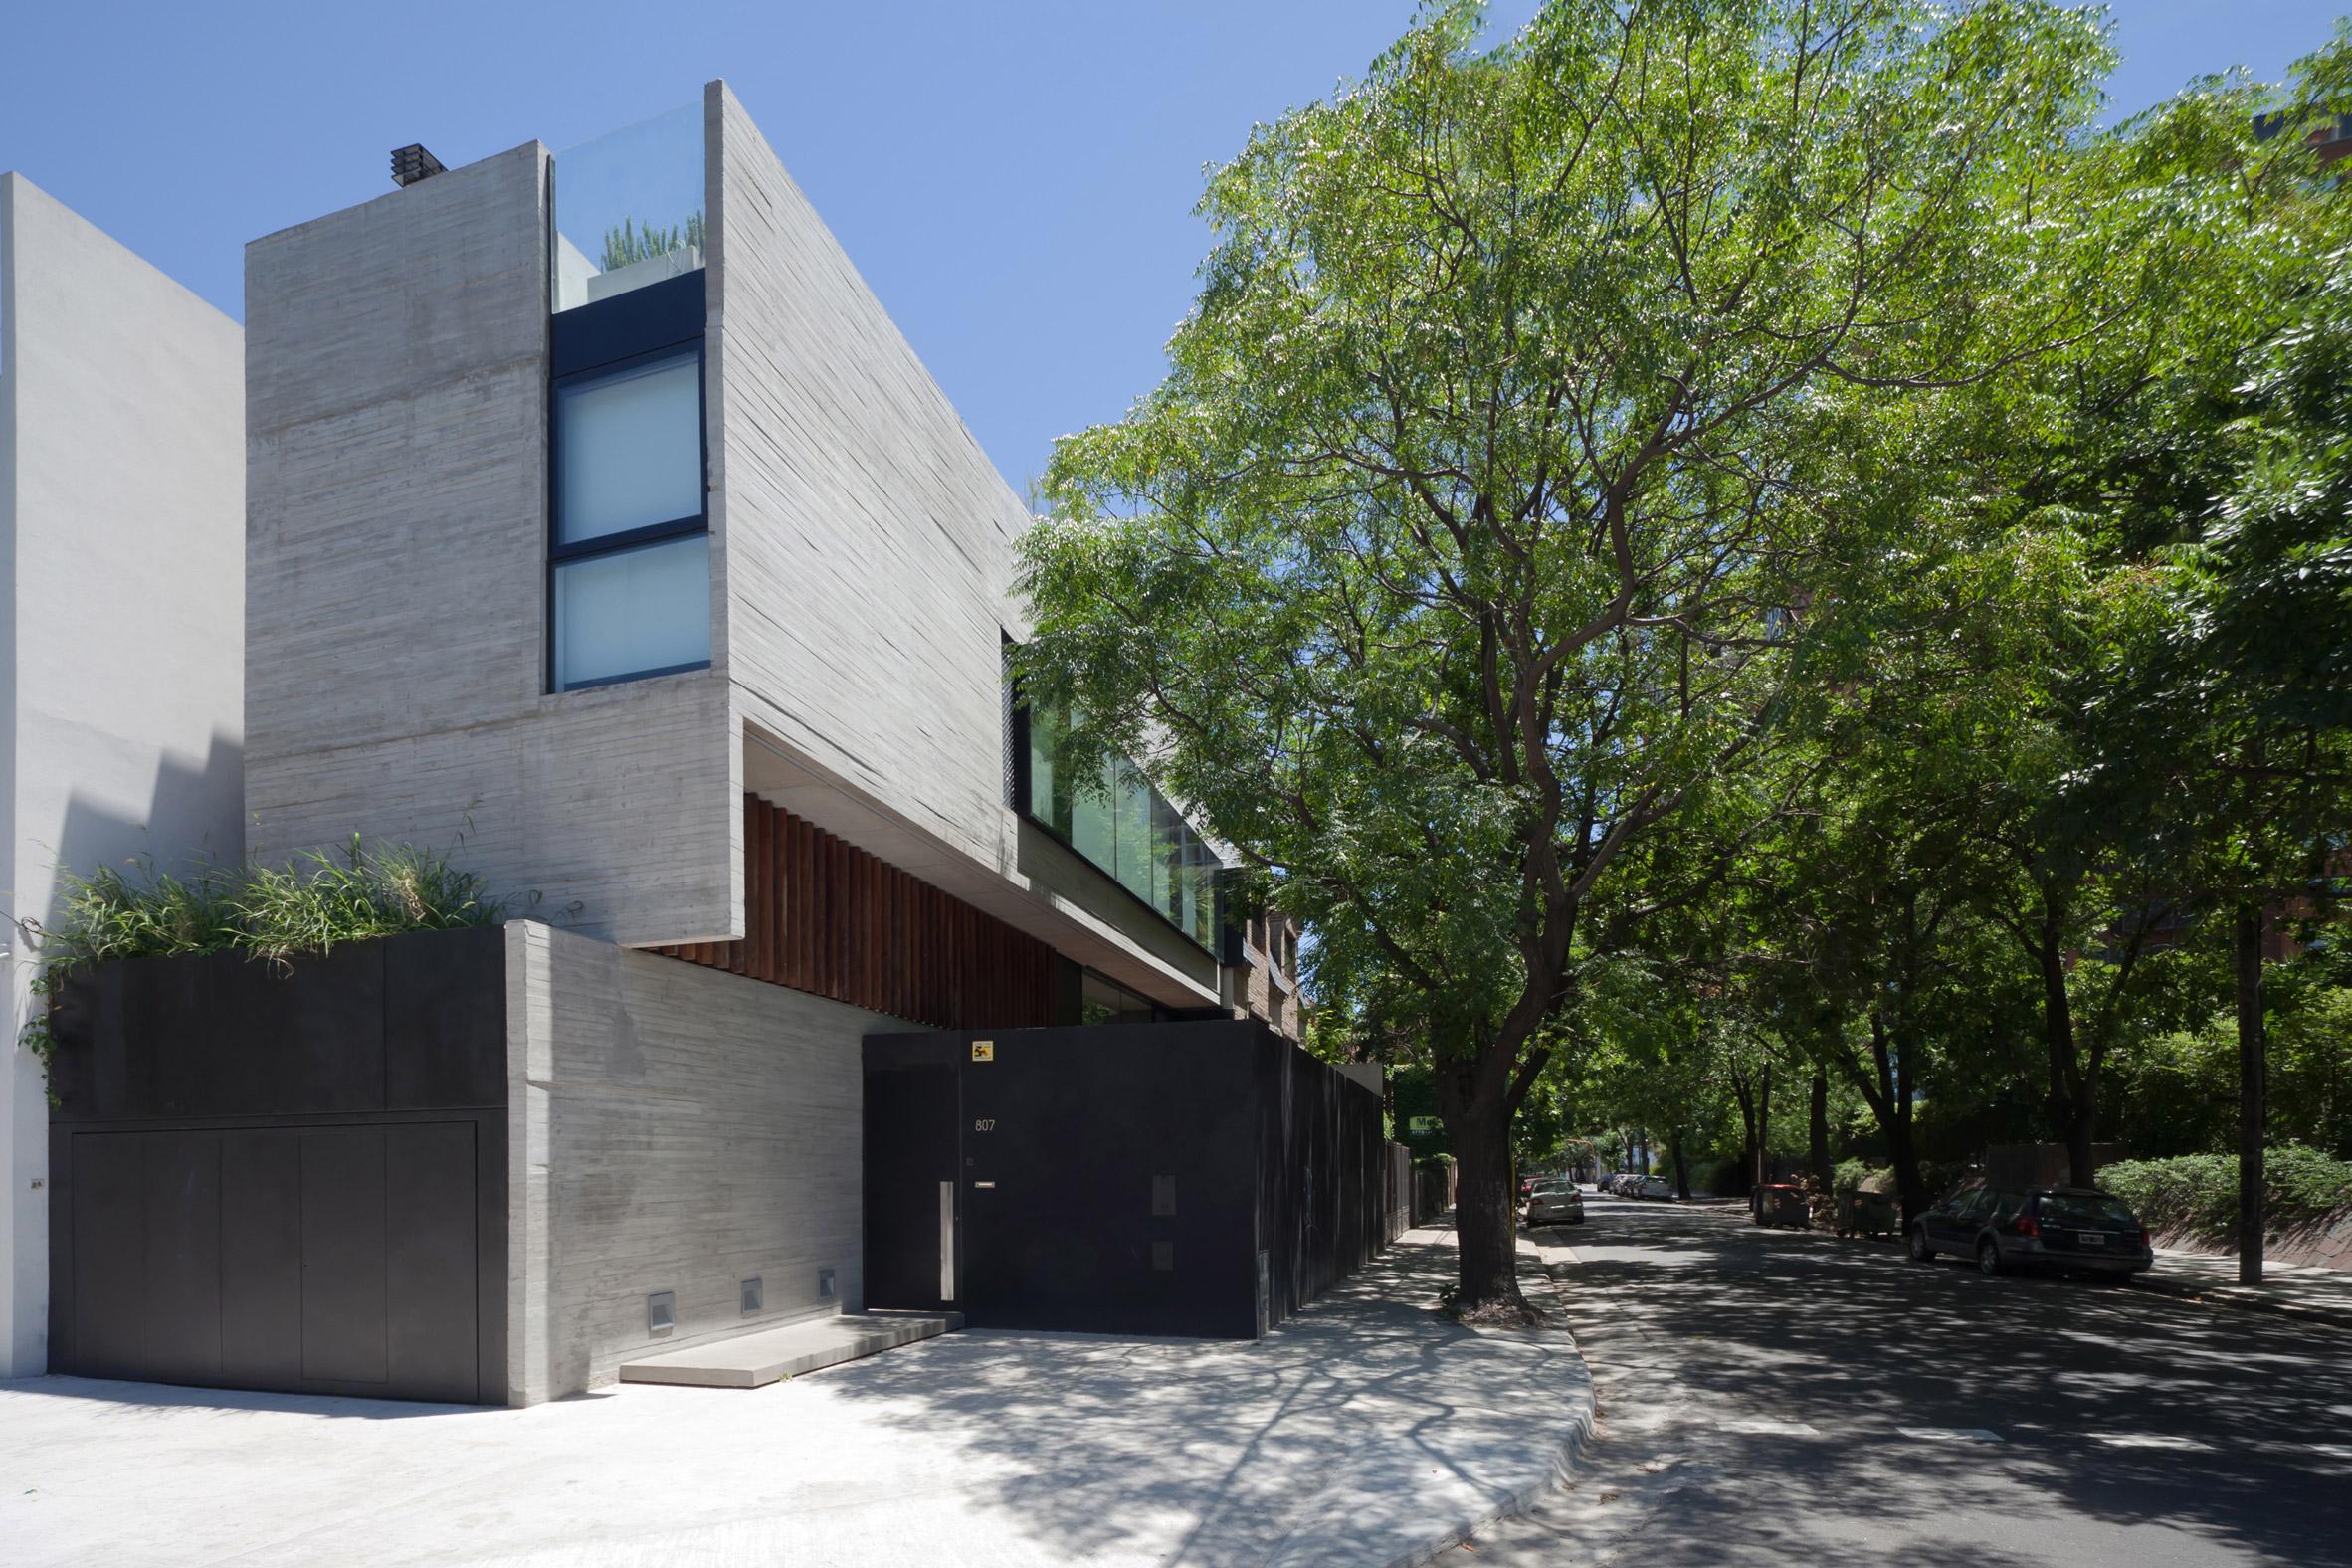 Architecture firm Dieguez Fridman designs concrete Corner House in Buenos Aires